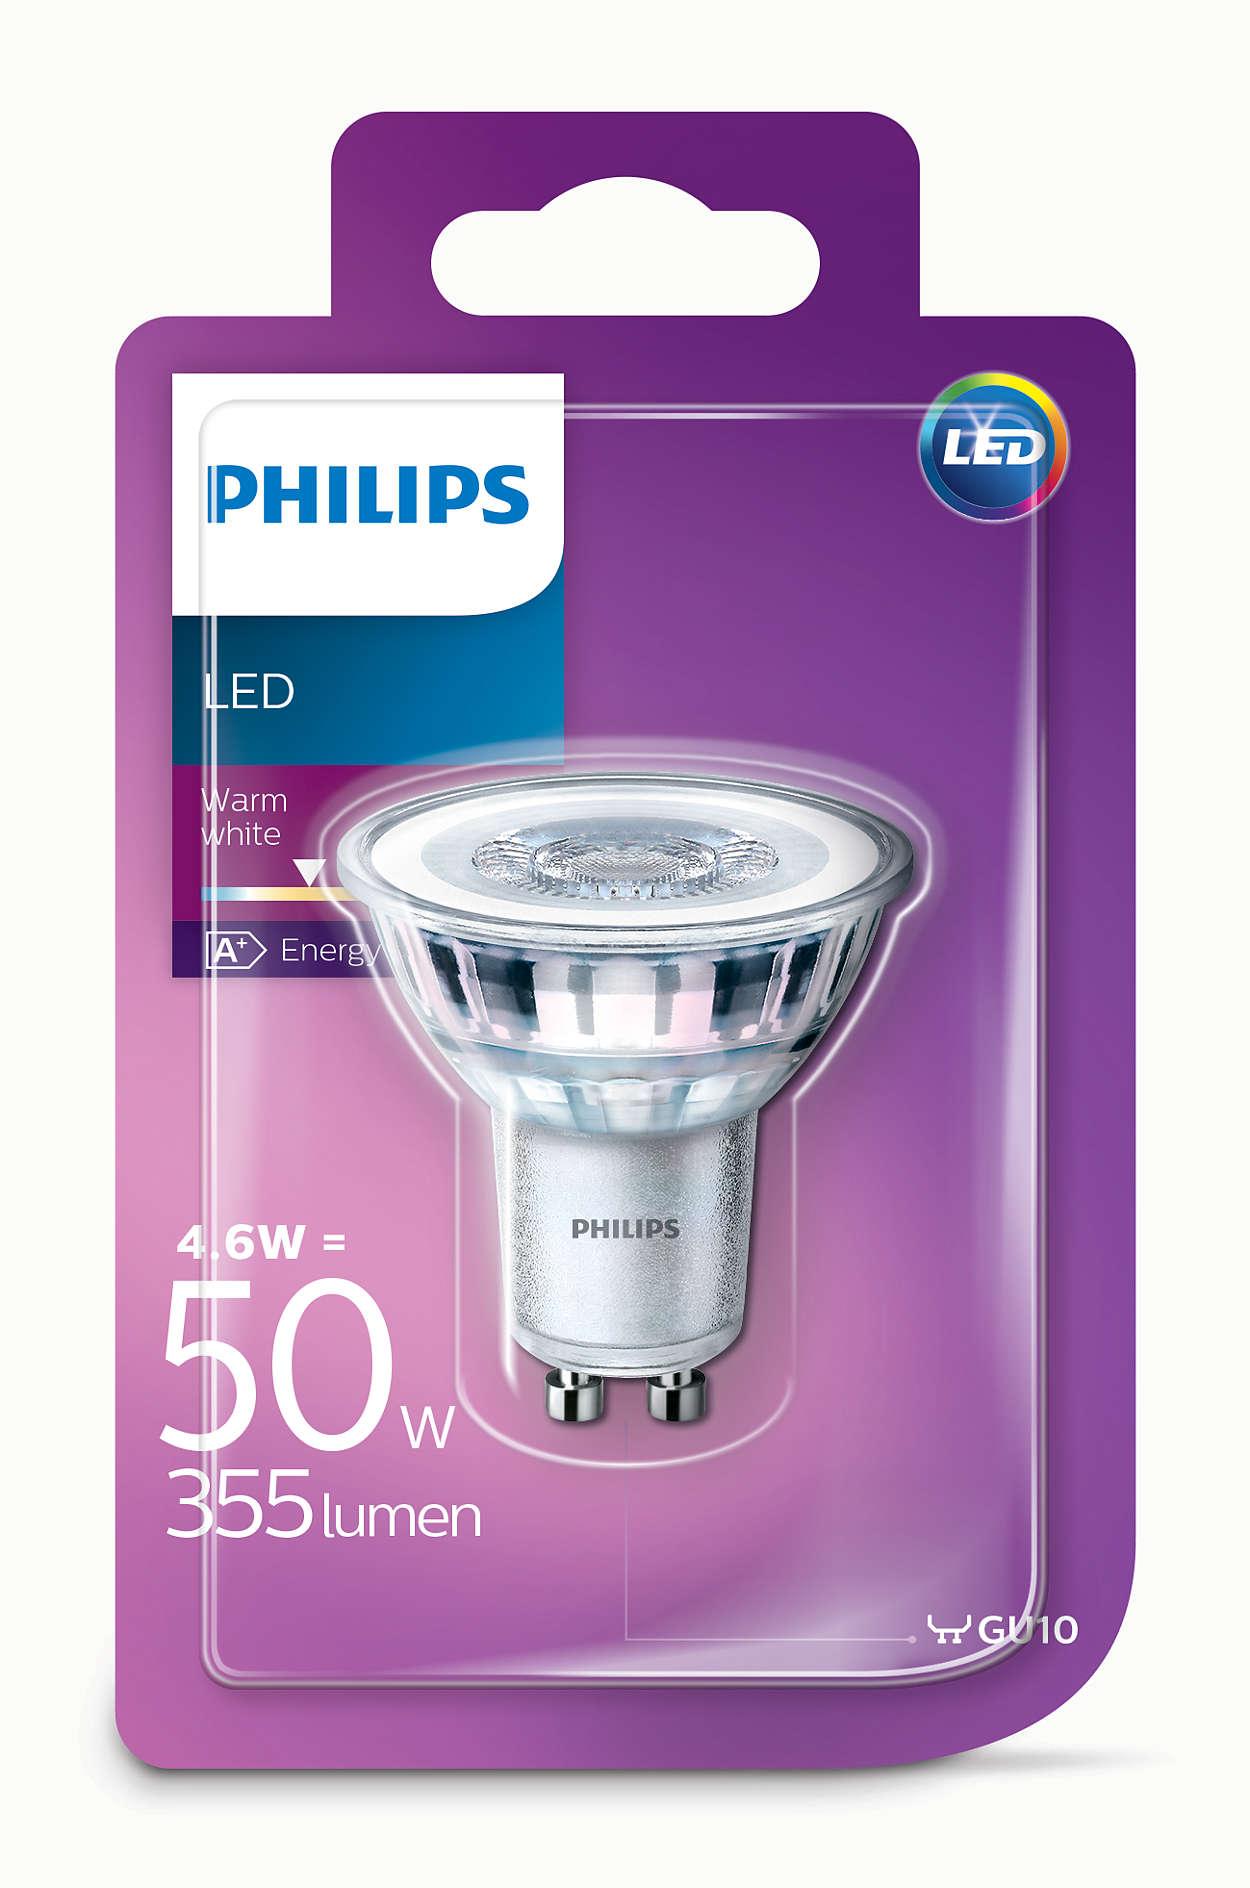 929001215201_x1_pack Luxus Philips Led Gu 10 Dekorationen